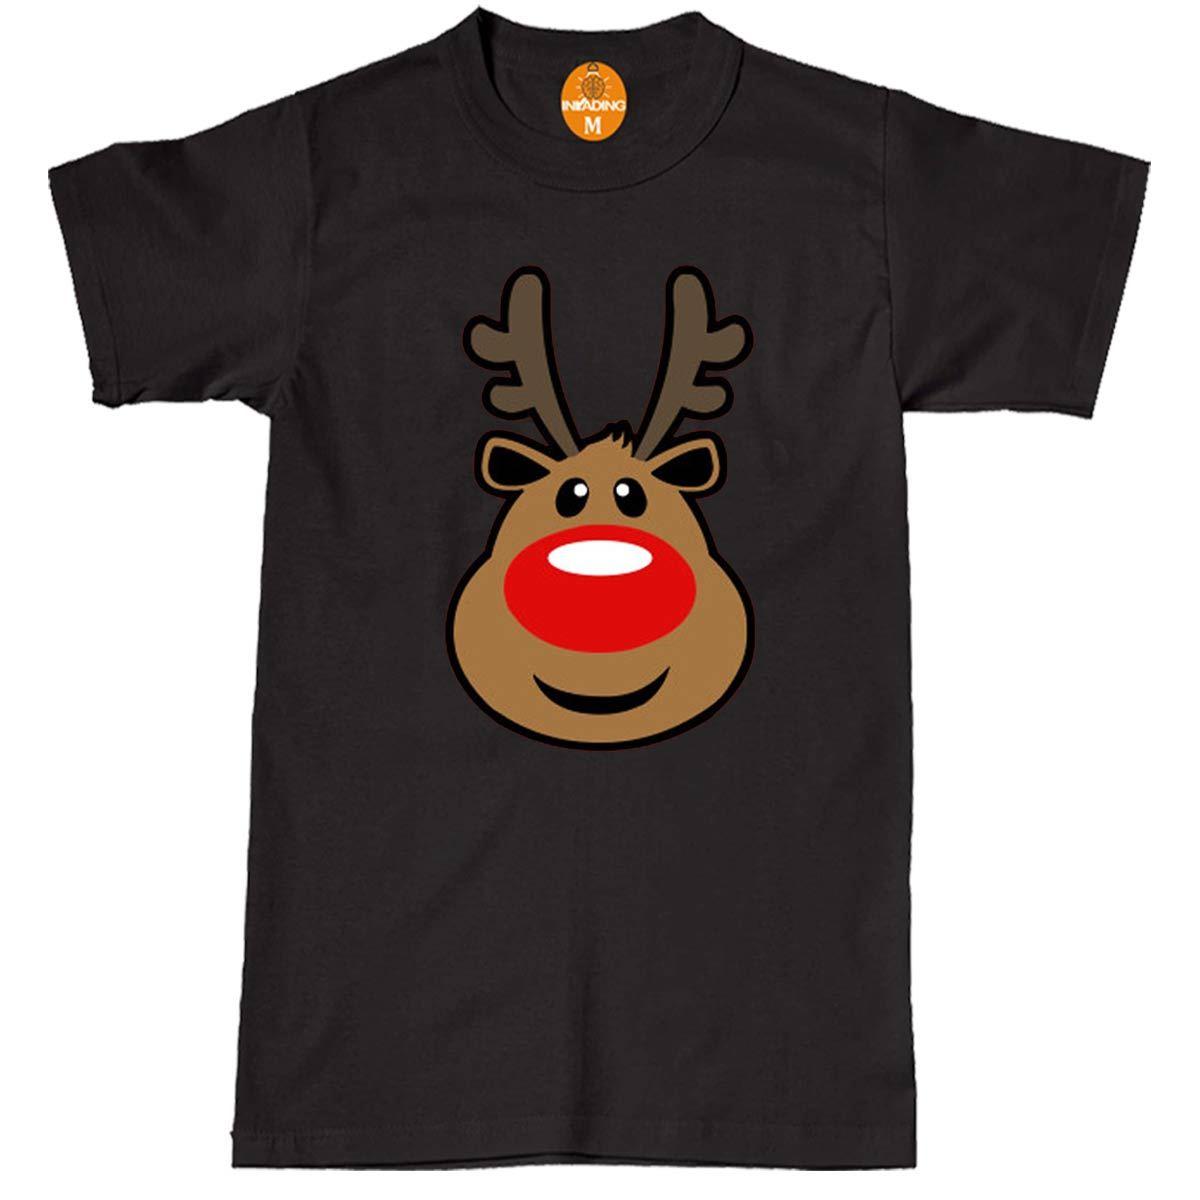 Men/'s Rudolph T-Shirt Reindeer Festive Xmas Gift Red Nose Christmas Santa